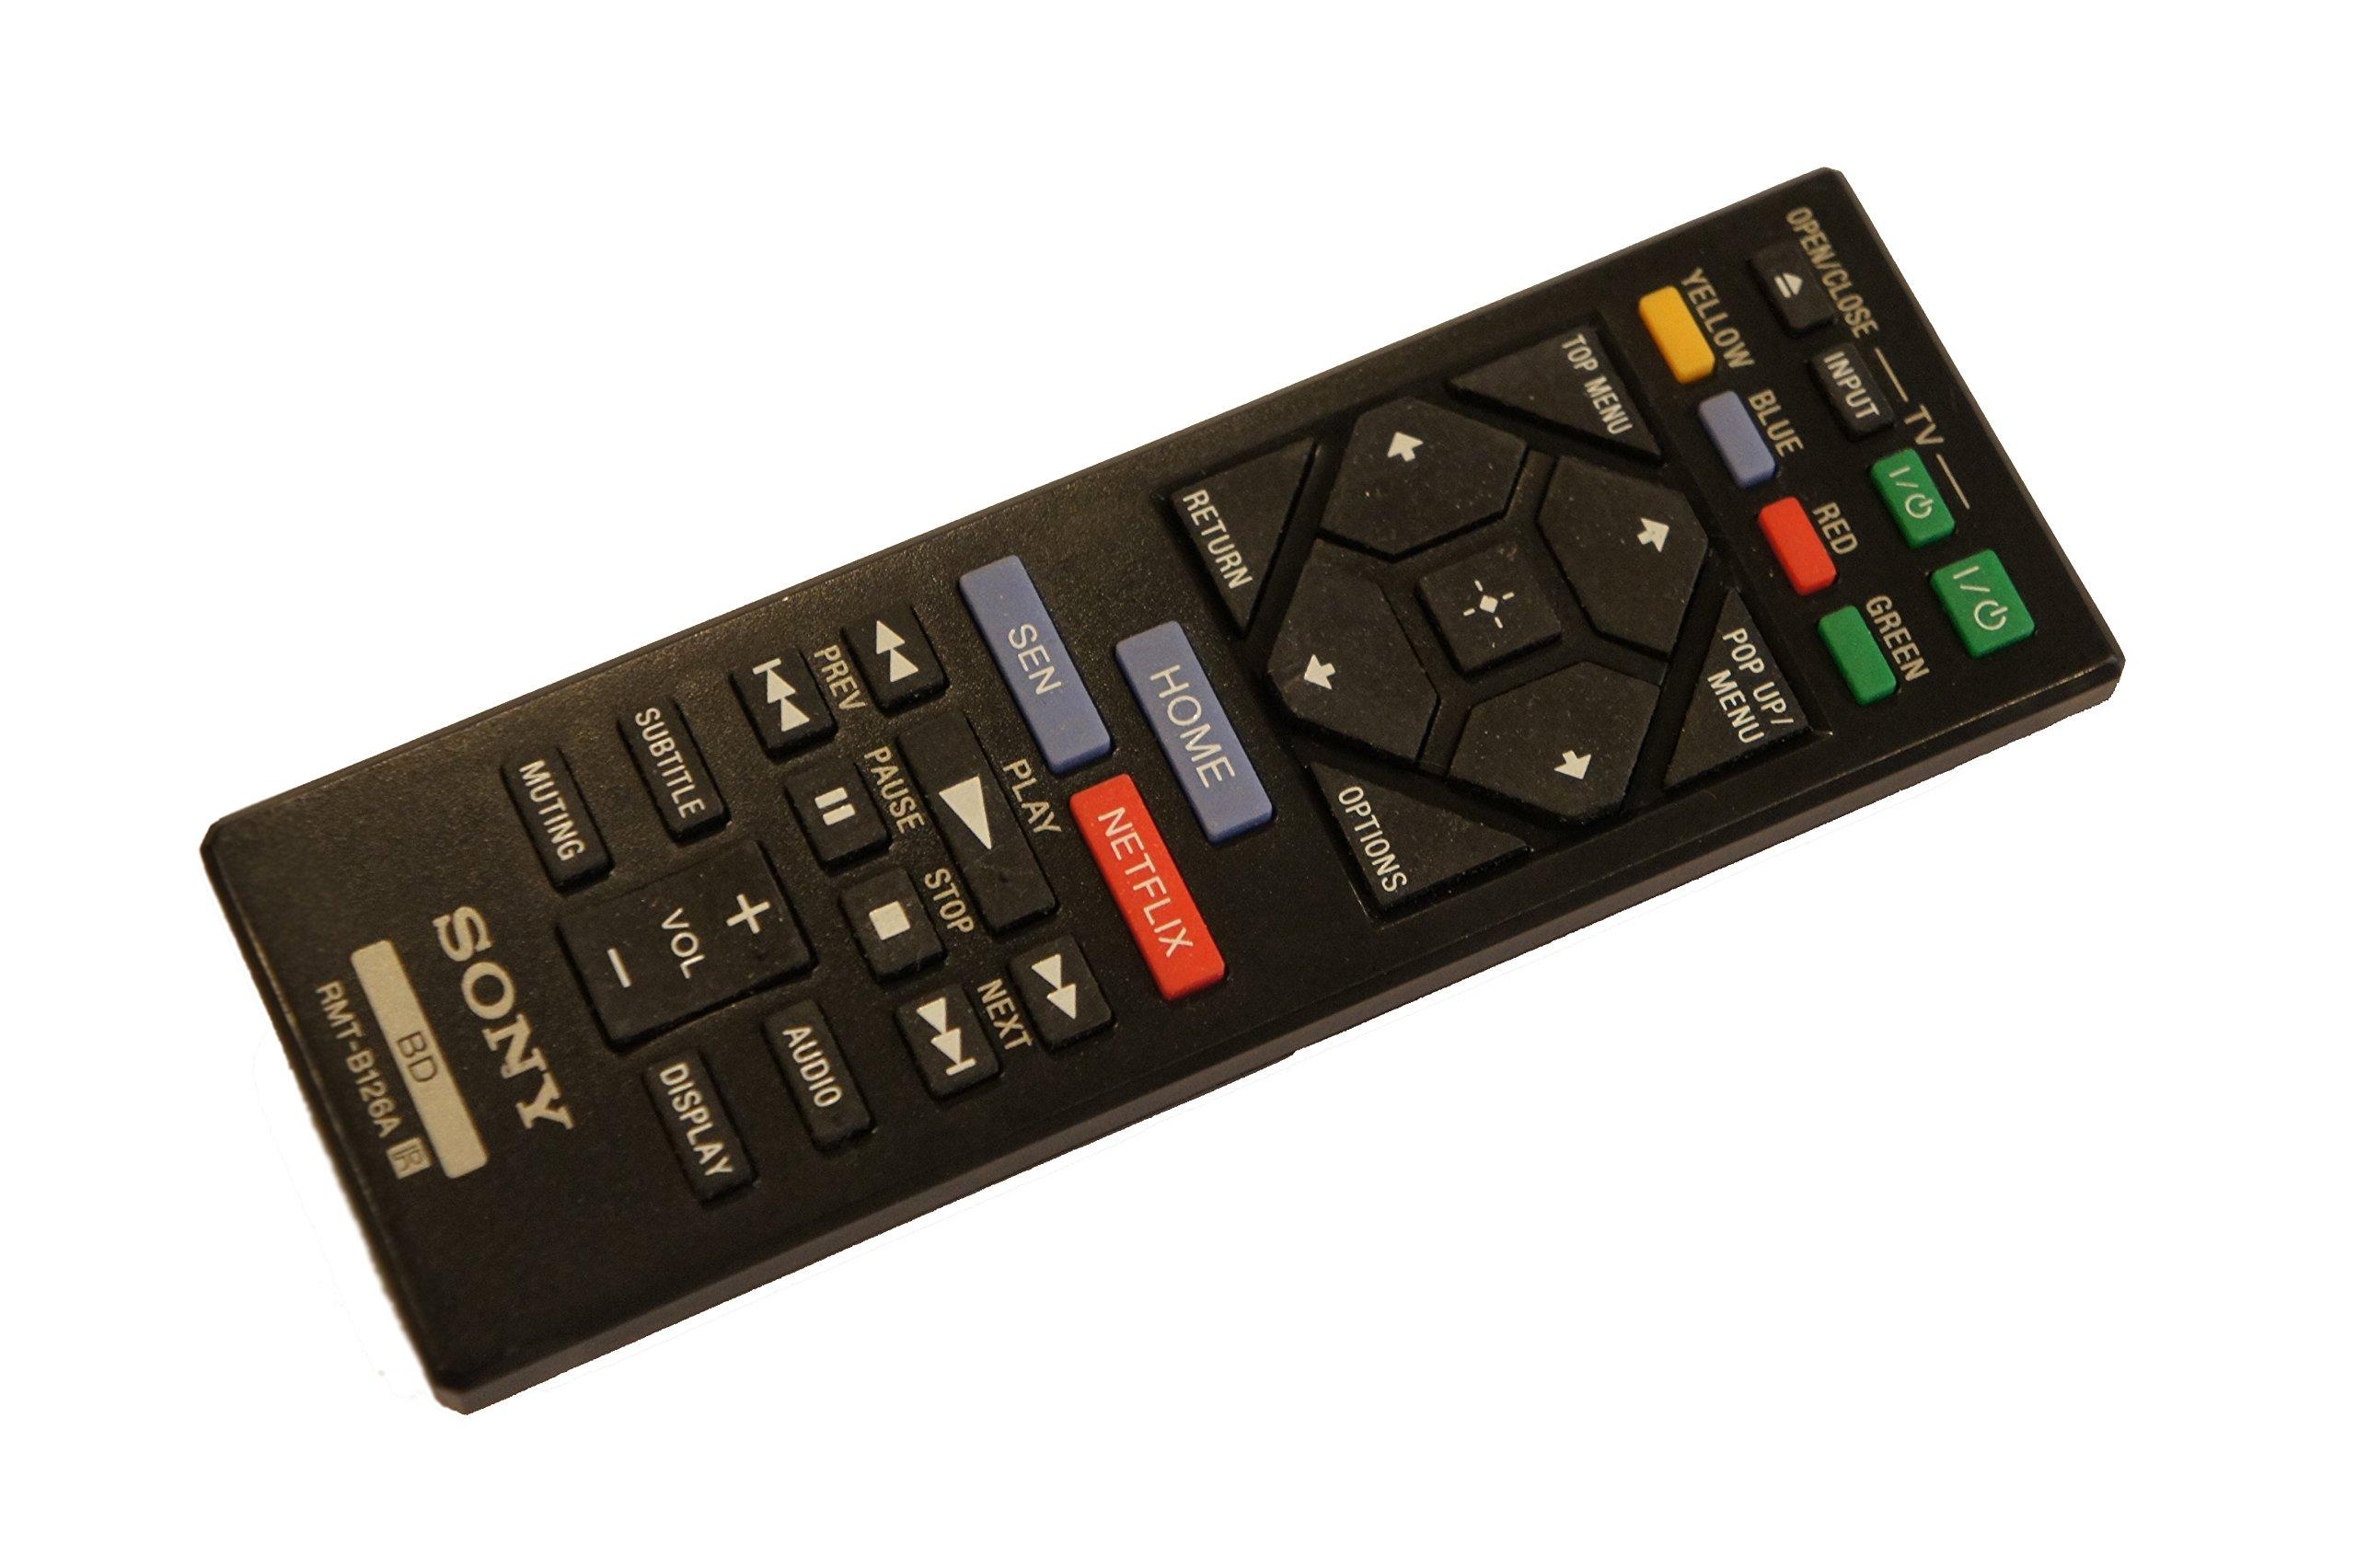 Sony 149267811 Remote Control Genuine Original Equipment Manufacturer (OEM) part for Sony